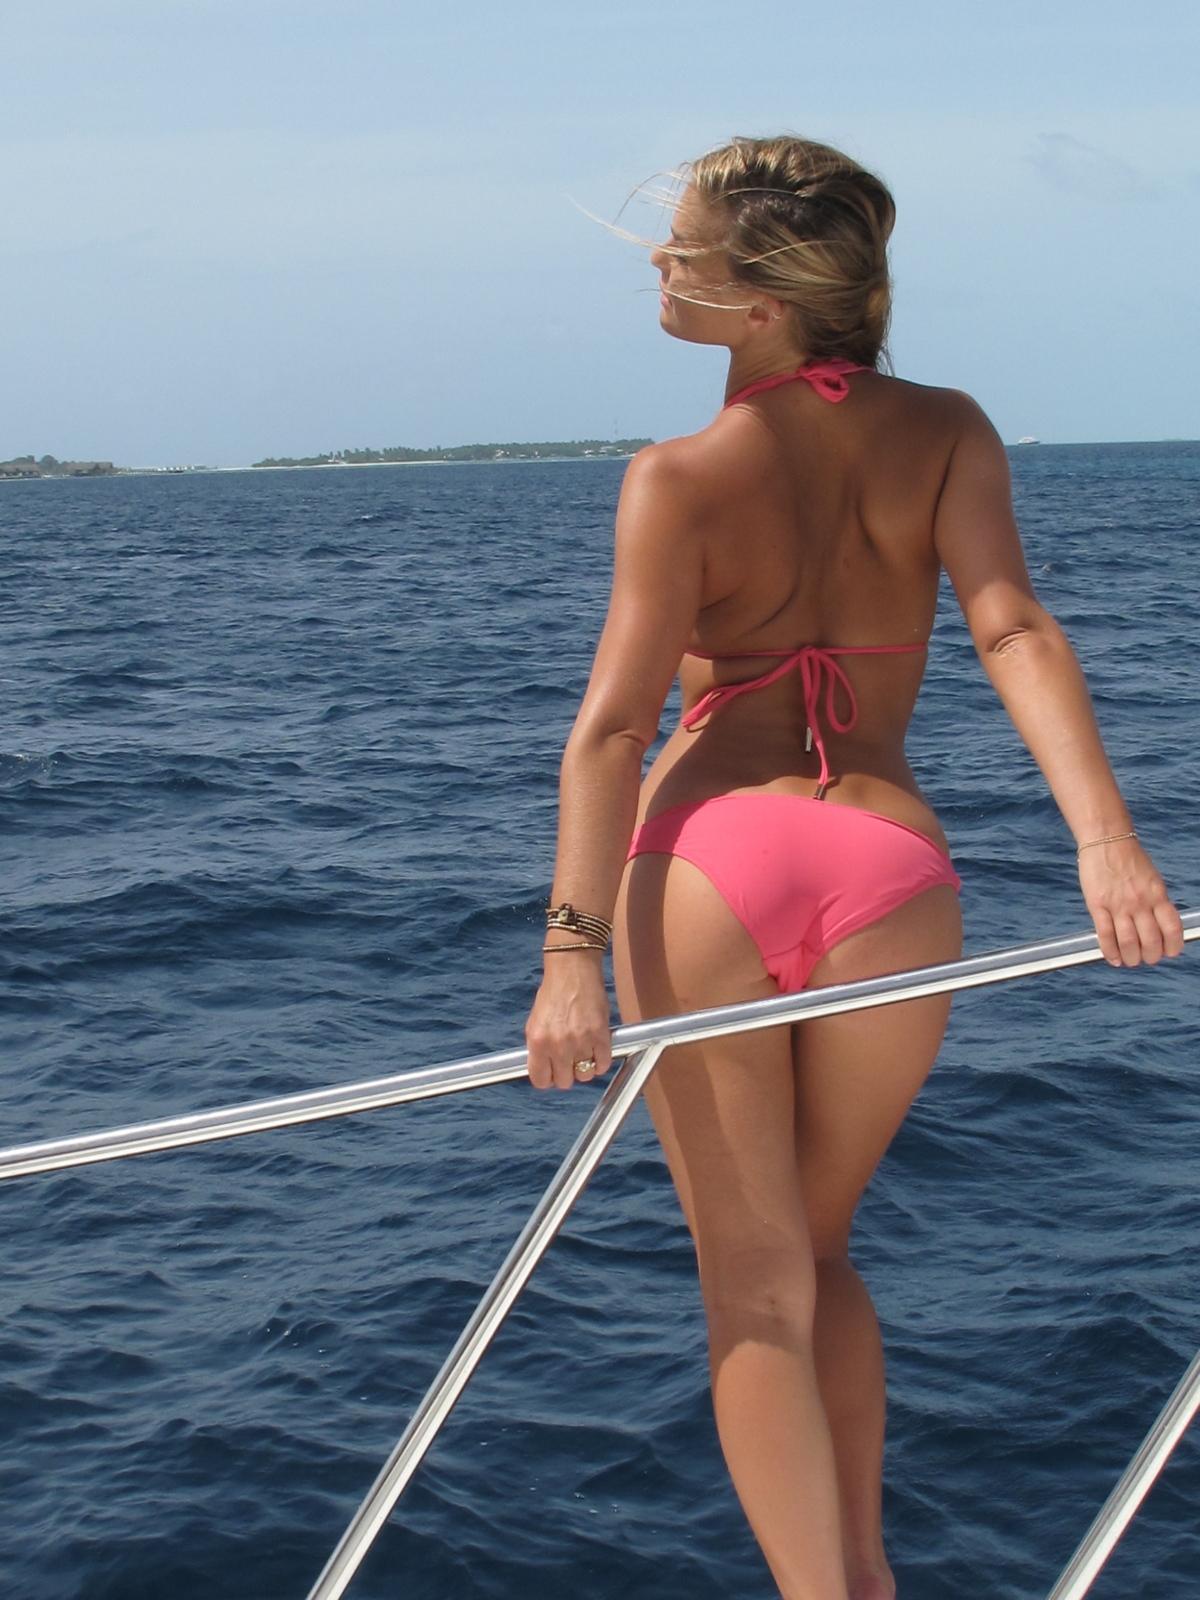 http://4.bp.blogspot.com/-U8A_x5UtWGw/TxMbDutuYmI/AAAAAAAAEu0/lMvThLtlKNI/s1600/Bar_Refaeli_Anonymous_89780_Bar_refaeli_hot_sexy_in_bikini_sexy_swimsuit4.jpg